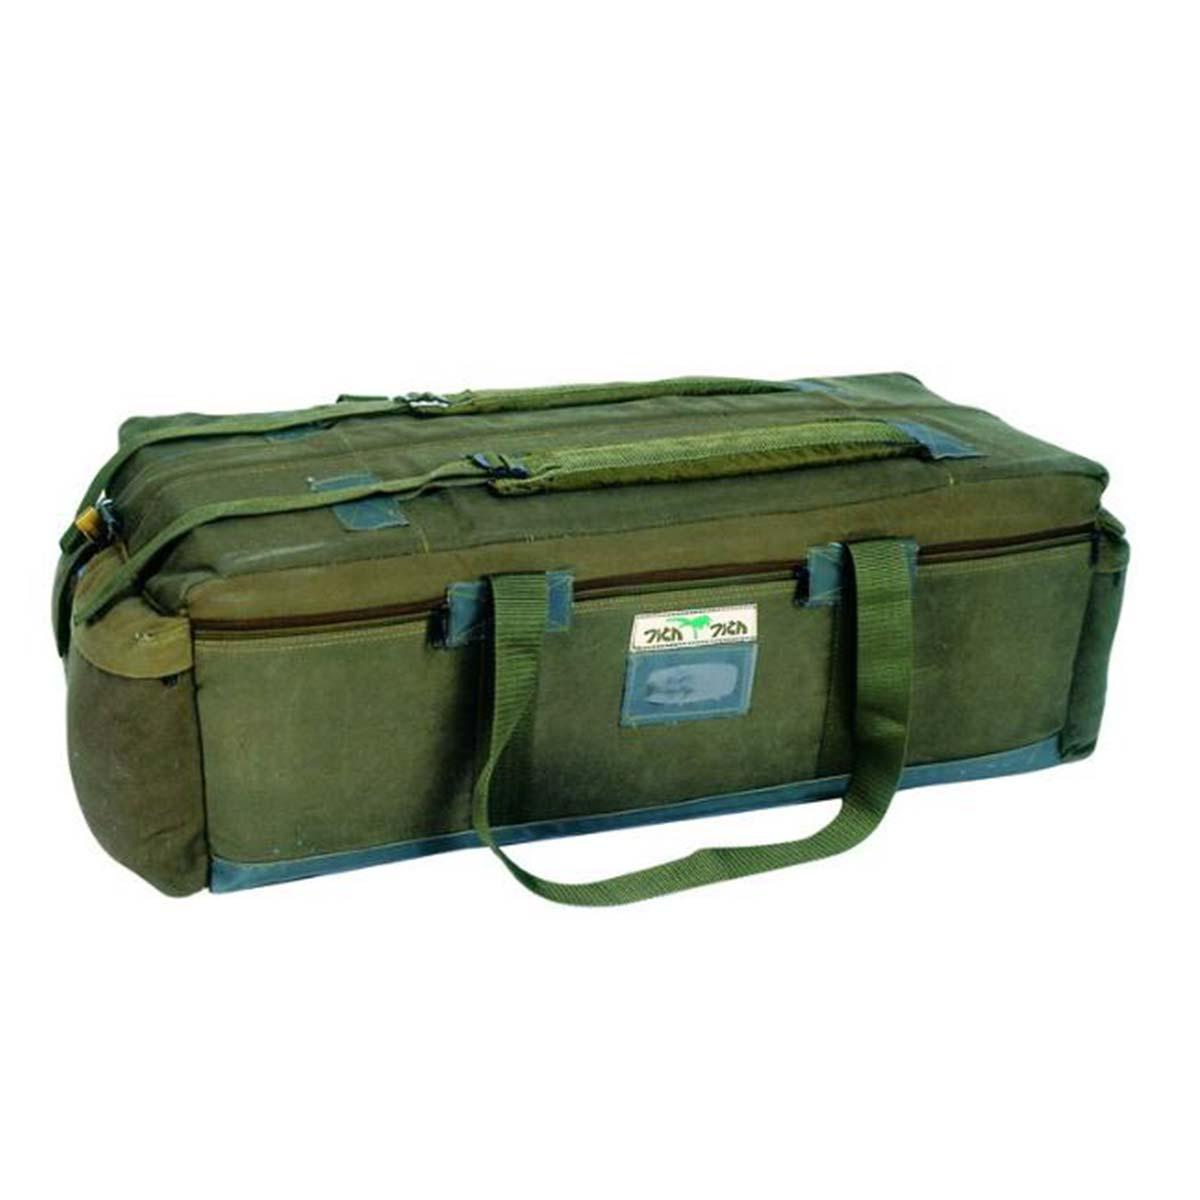 hagor-500501-od-green Duffle Bag